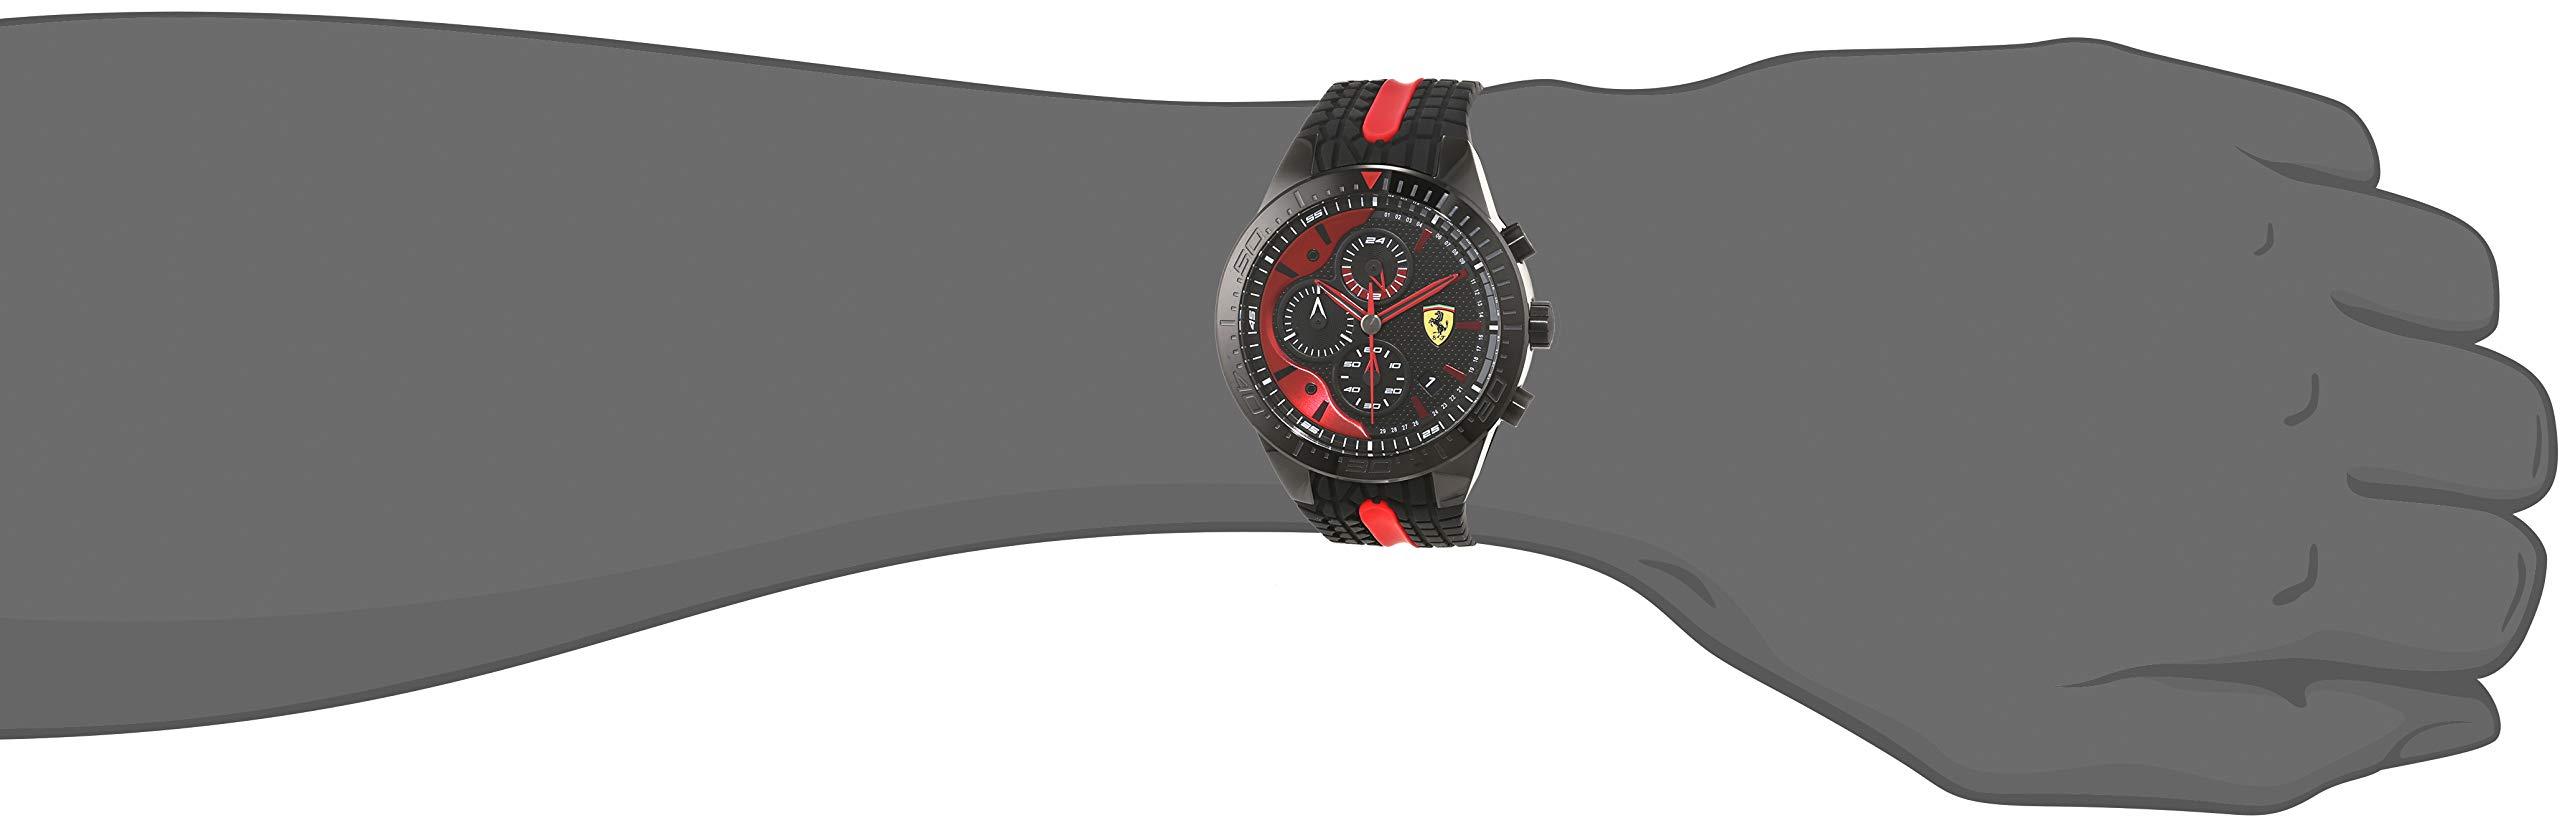 Scuderia-Ferrari-Armbanduhr-830592